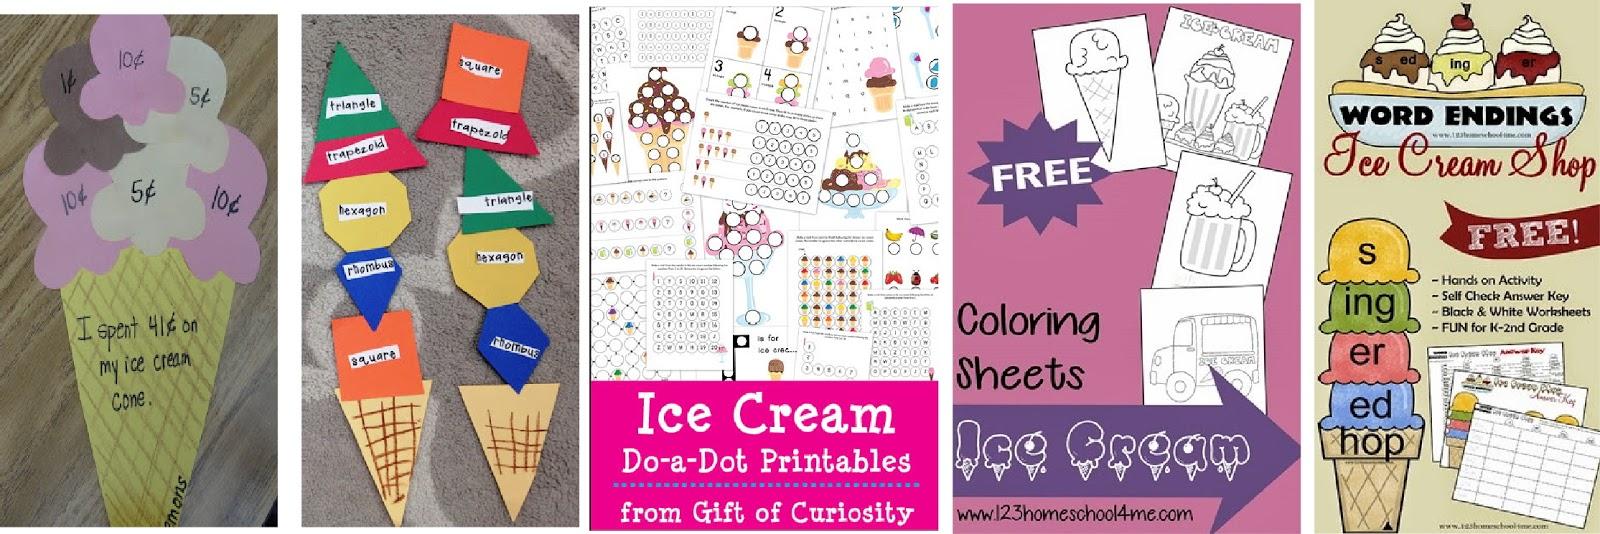 33 Ice Cream Crafts and Kids Activities